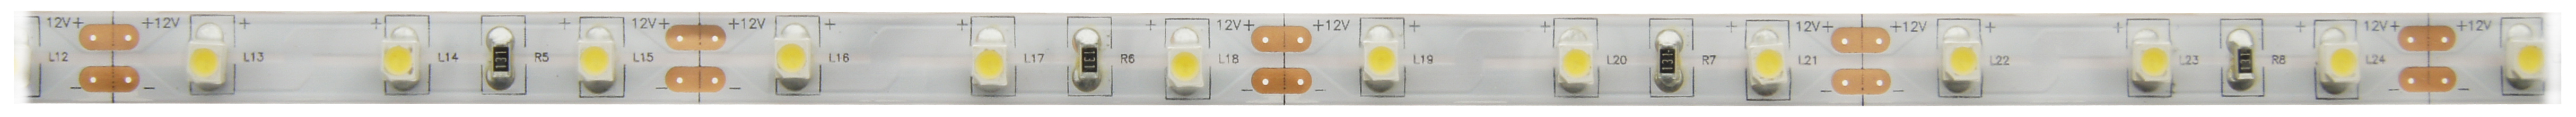 1 Stk FS 24, CLW, Ra=90+, 7W/m, 460lm/m, 12VDC, IP44, l=5m LIFS001000